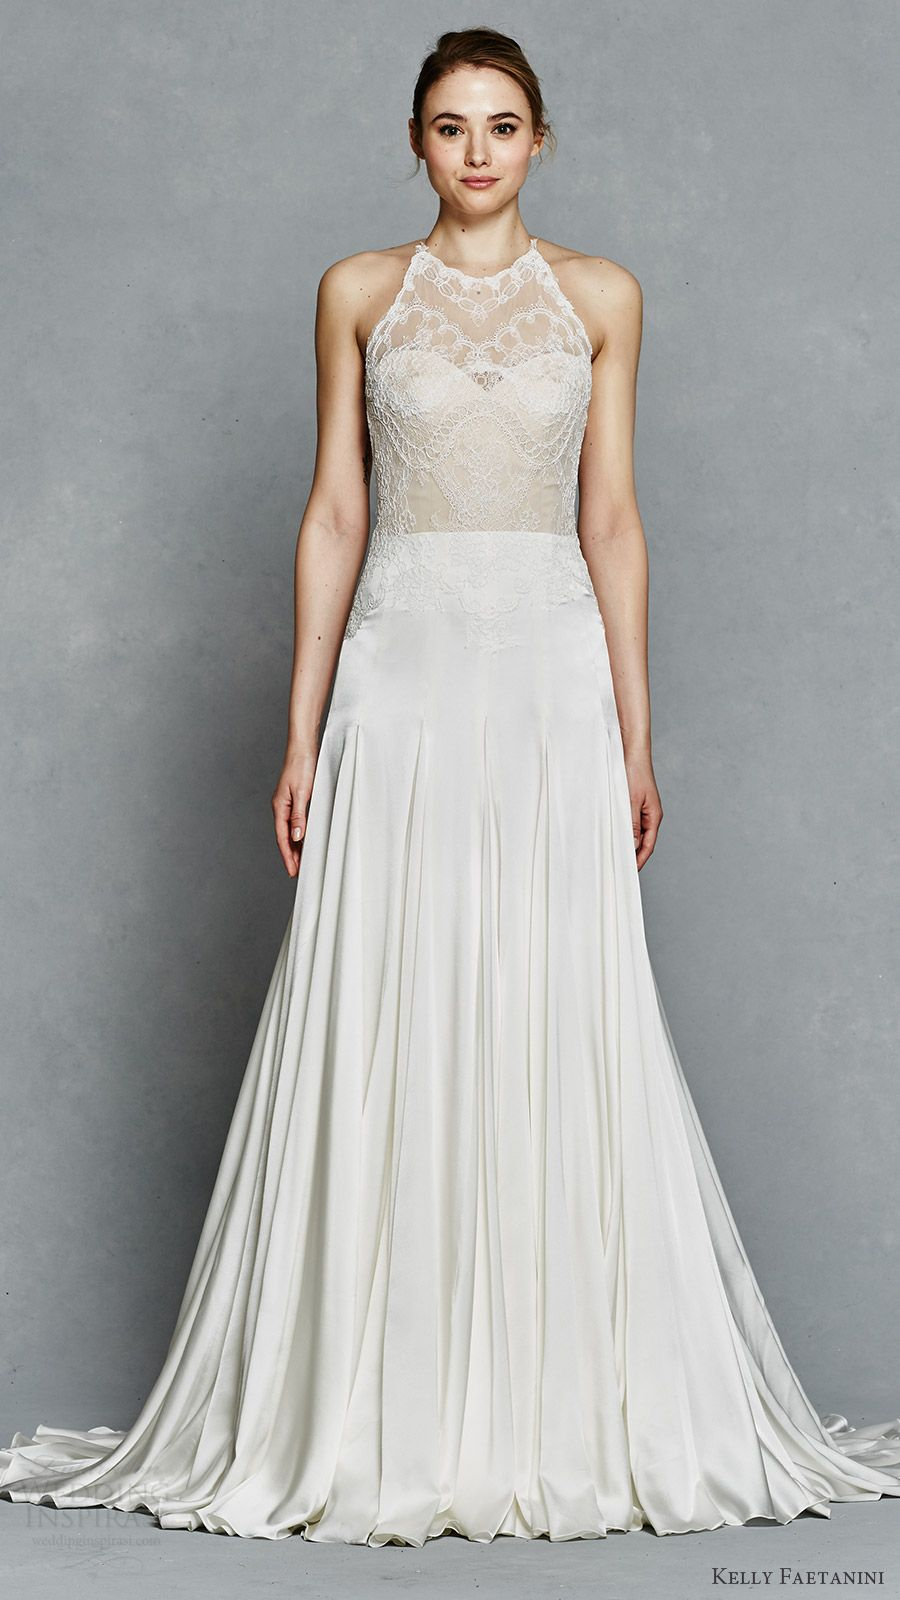 Kelly Faetanini Spring 2017 Wedding Dresses   Bodice wedding dress ...